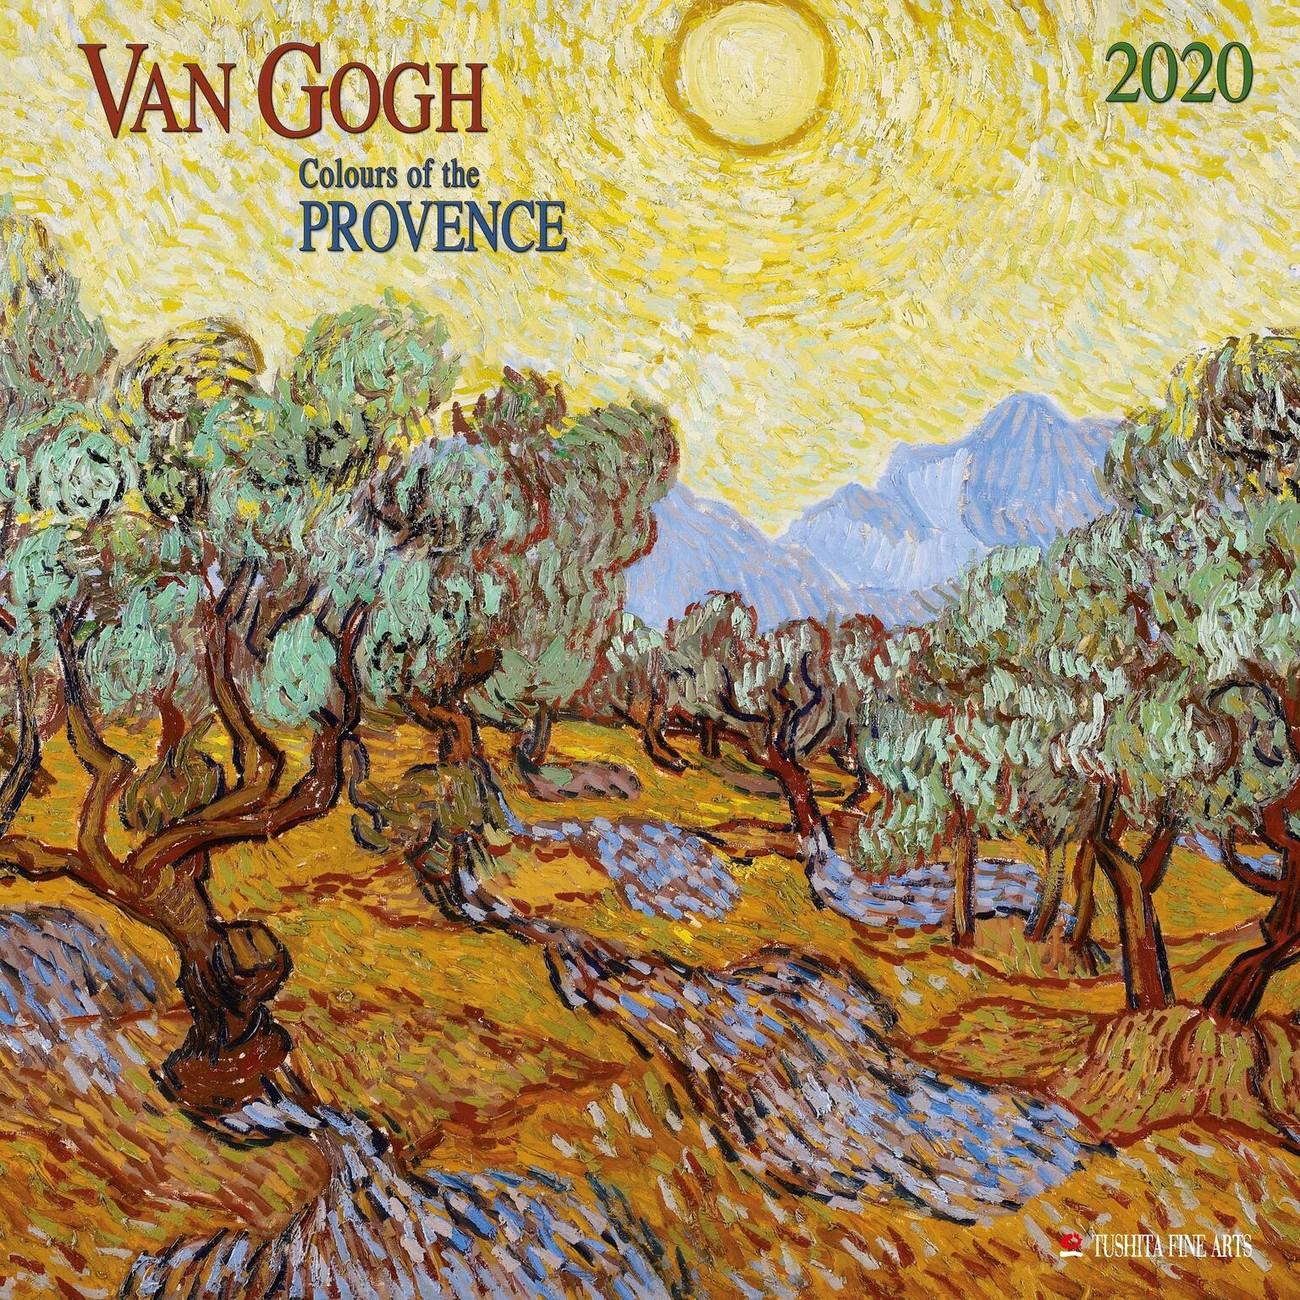 Calendar 2020 Van Gogh - Colours Of The Provence